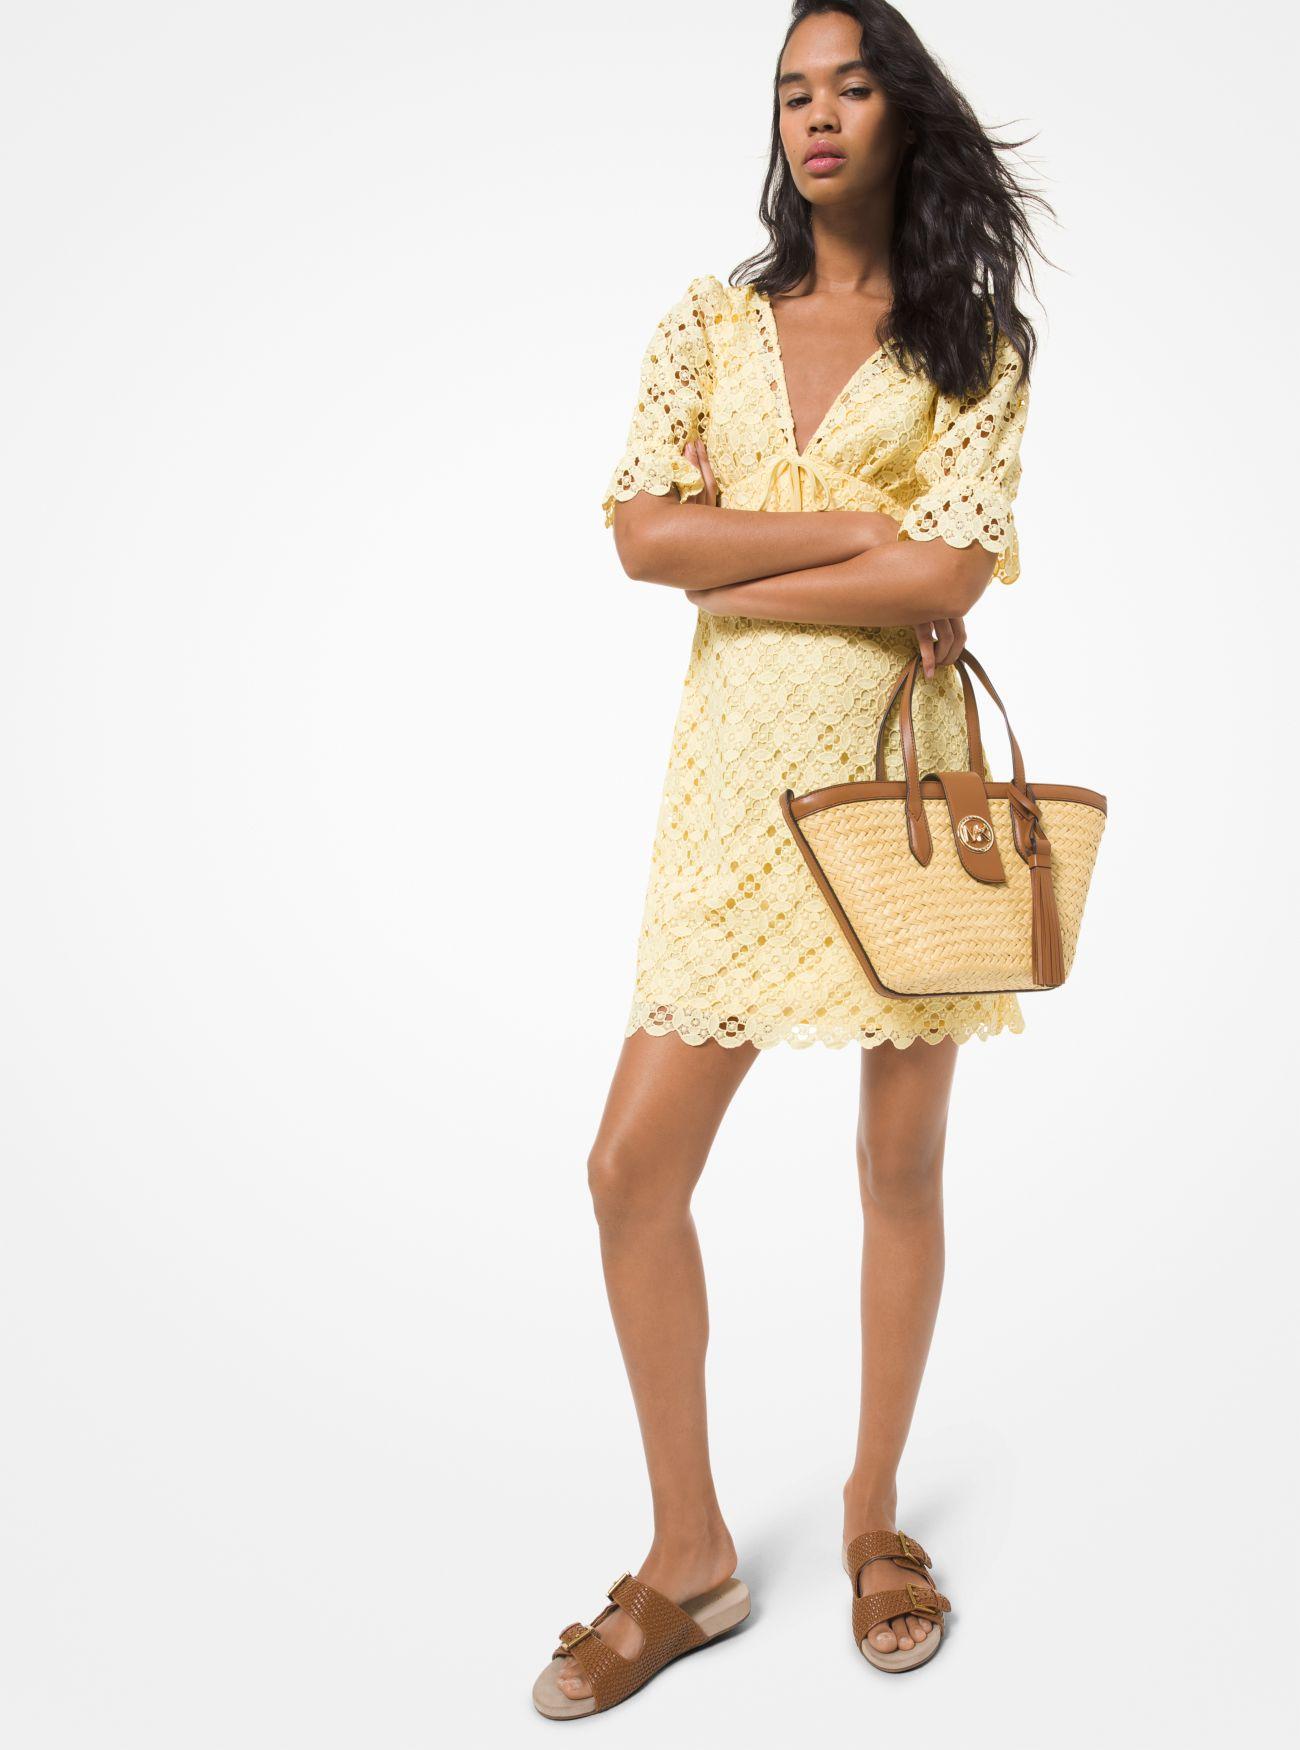 Lace Dress, Malibu Tote, Merritt Slide Sandal | Michael Kors